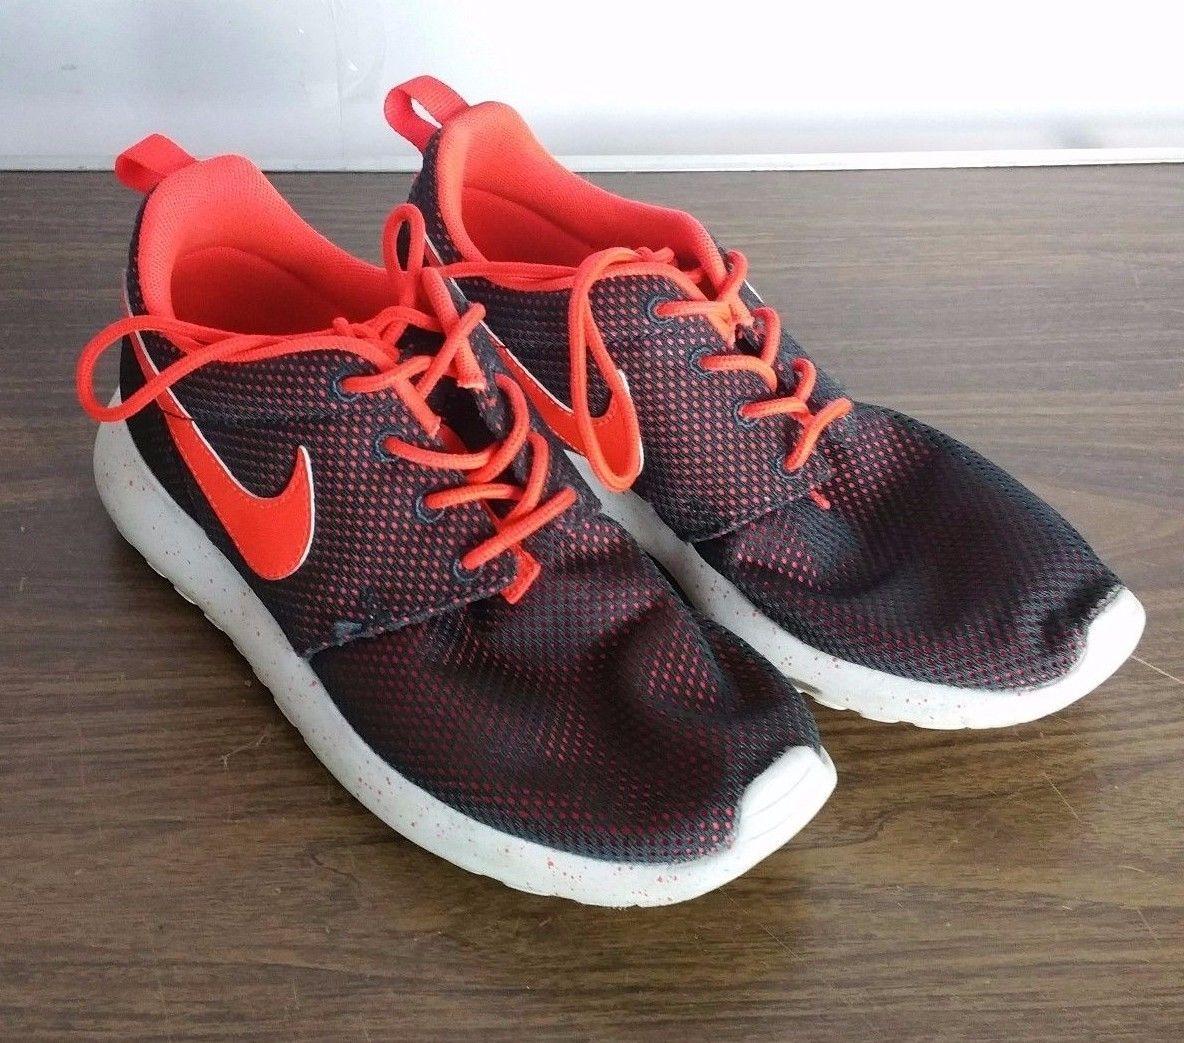 NIKE ROSHE RUN GS 599728 001 Youth Boys Size 6.5 Running